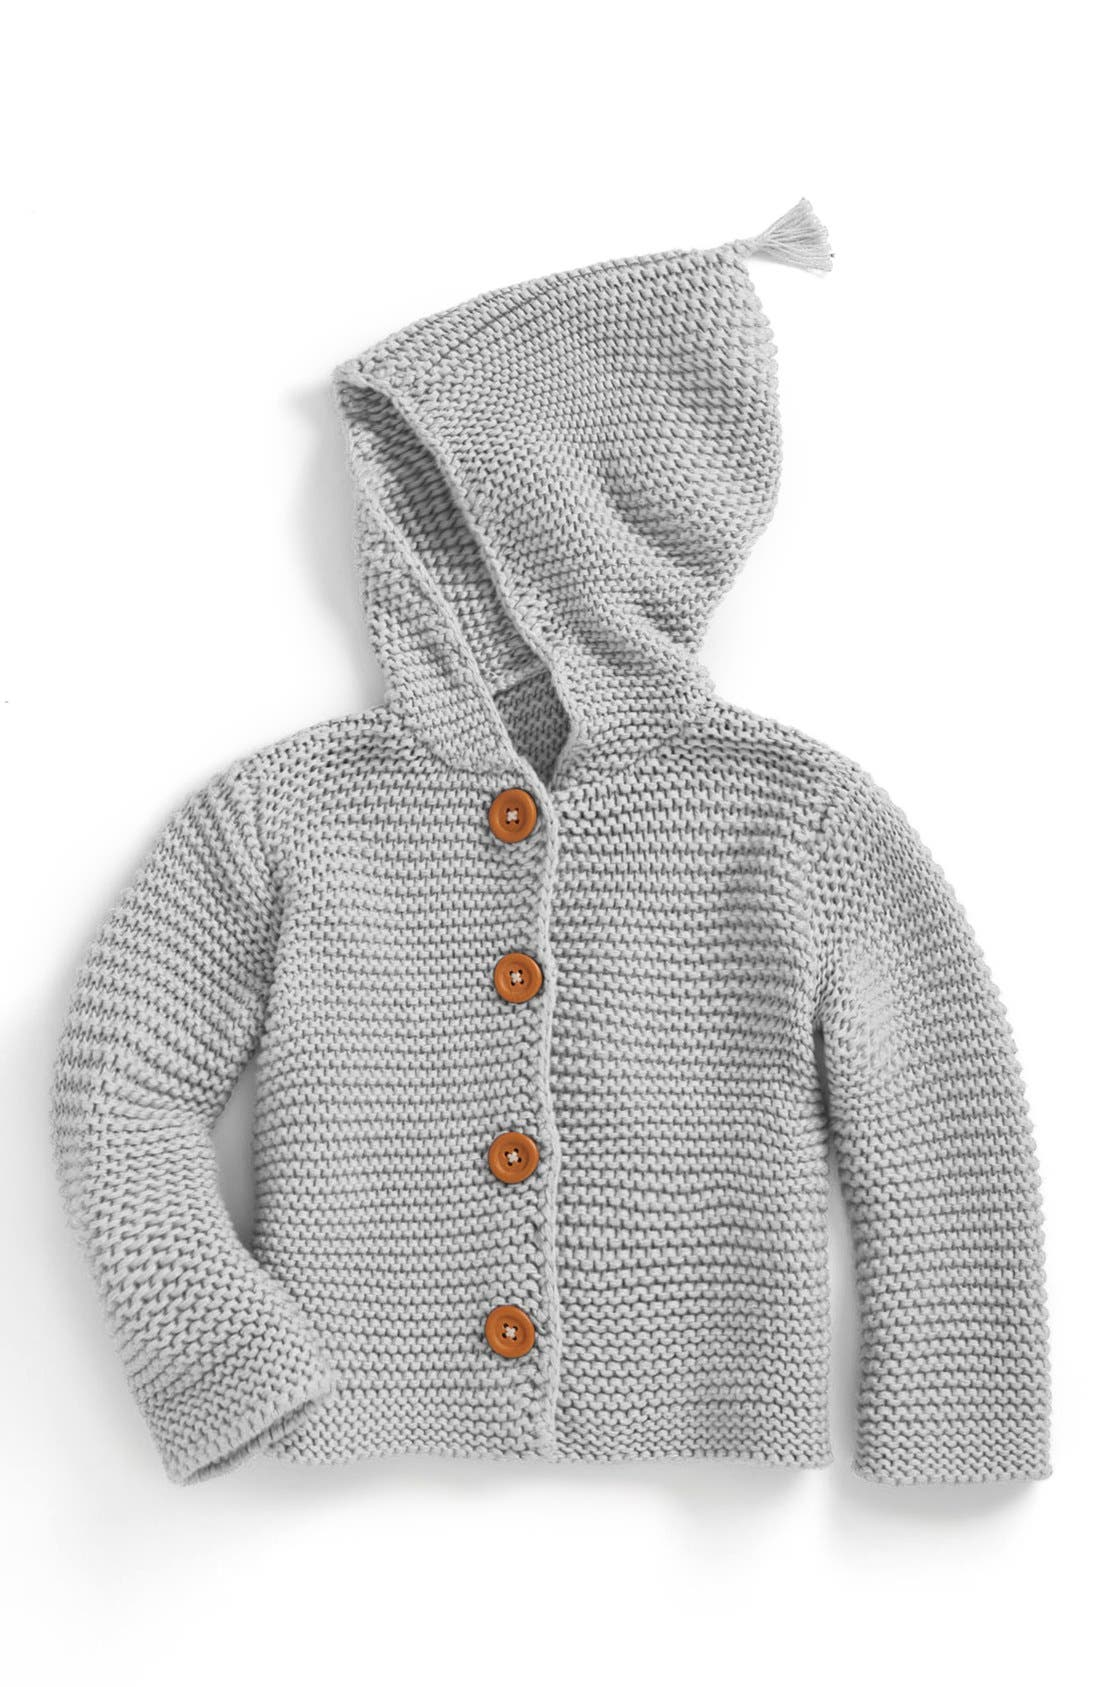 Alternate Image 1 Selected - Stem Baby 'Lofty' Organic Cotton Hooded Cardigan (Baby)